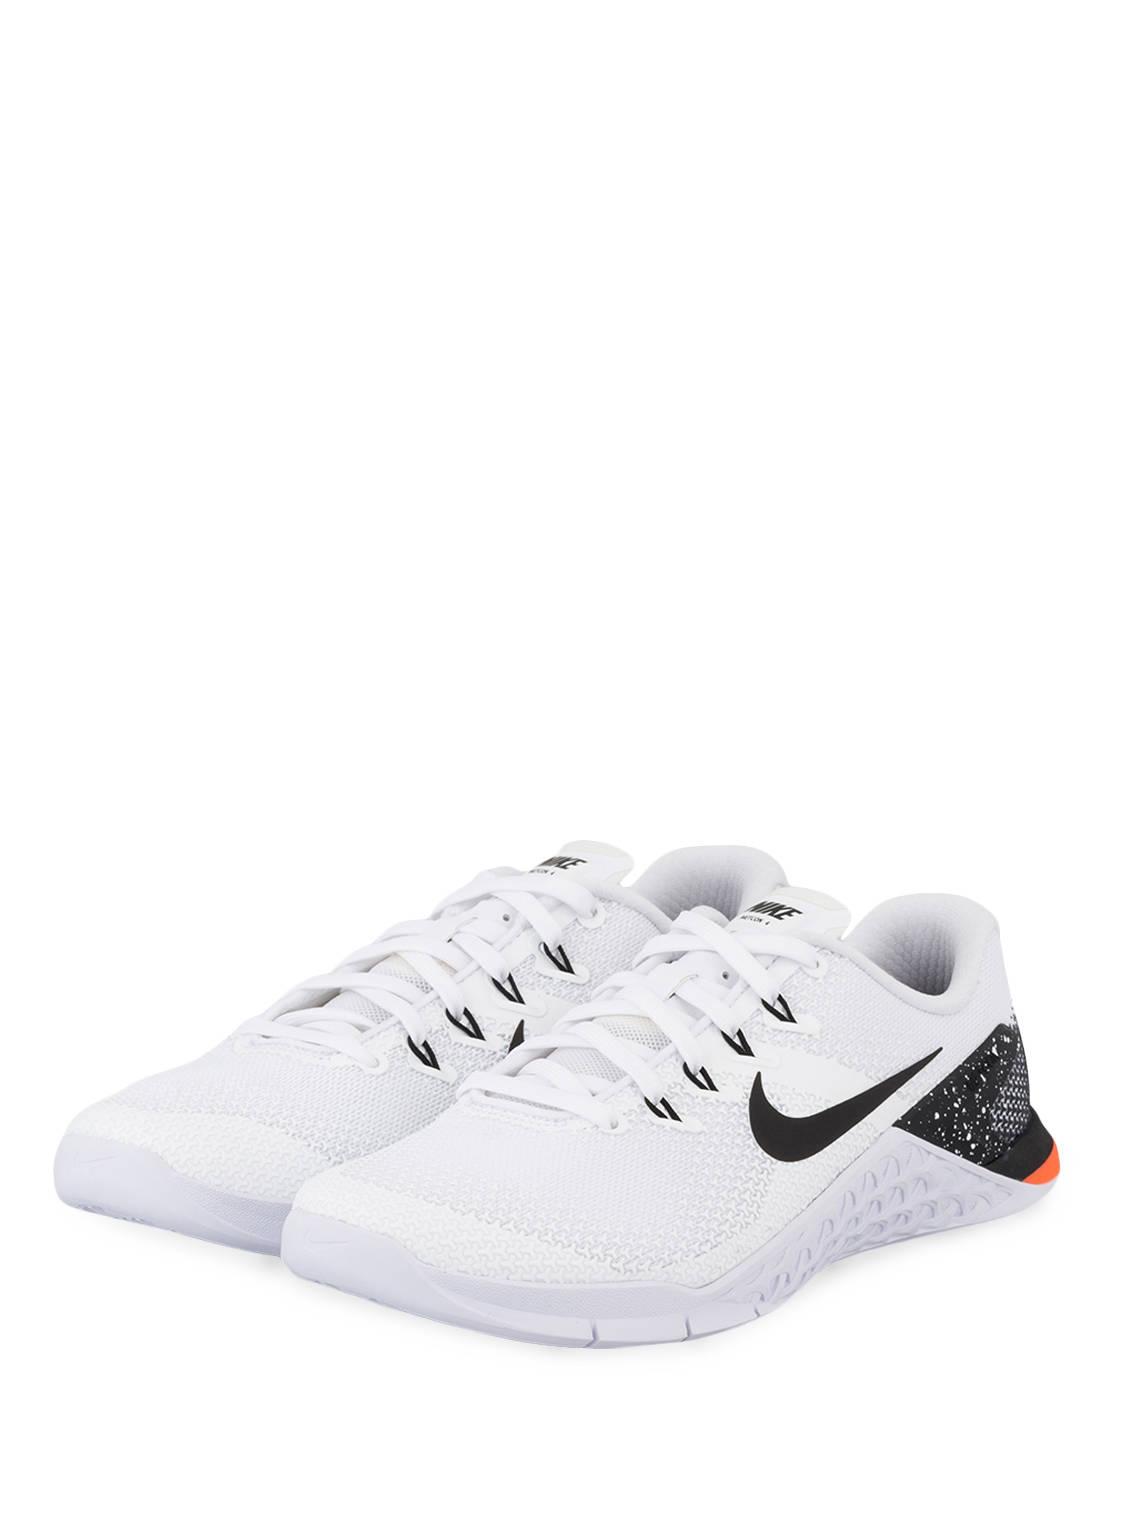 Nike Fitnessschuhe METCON 4